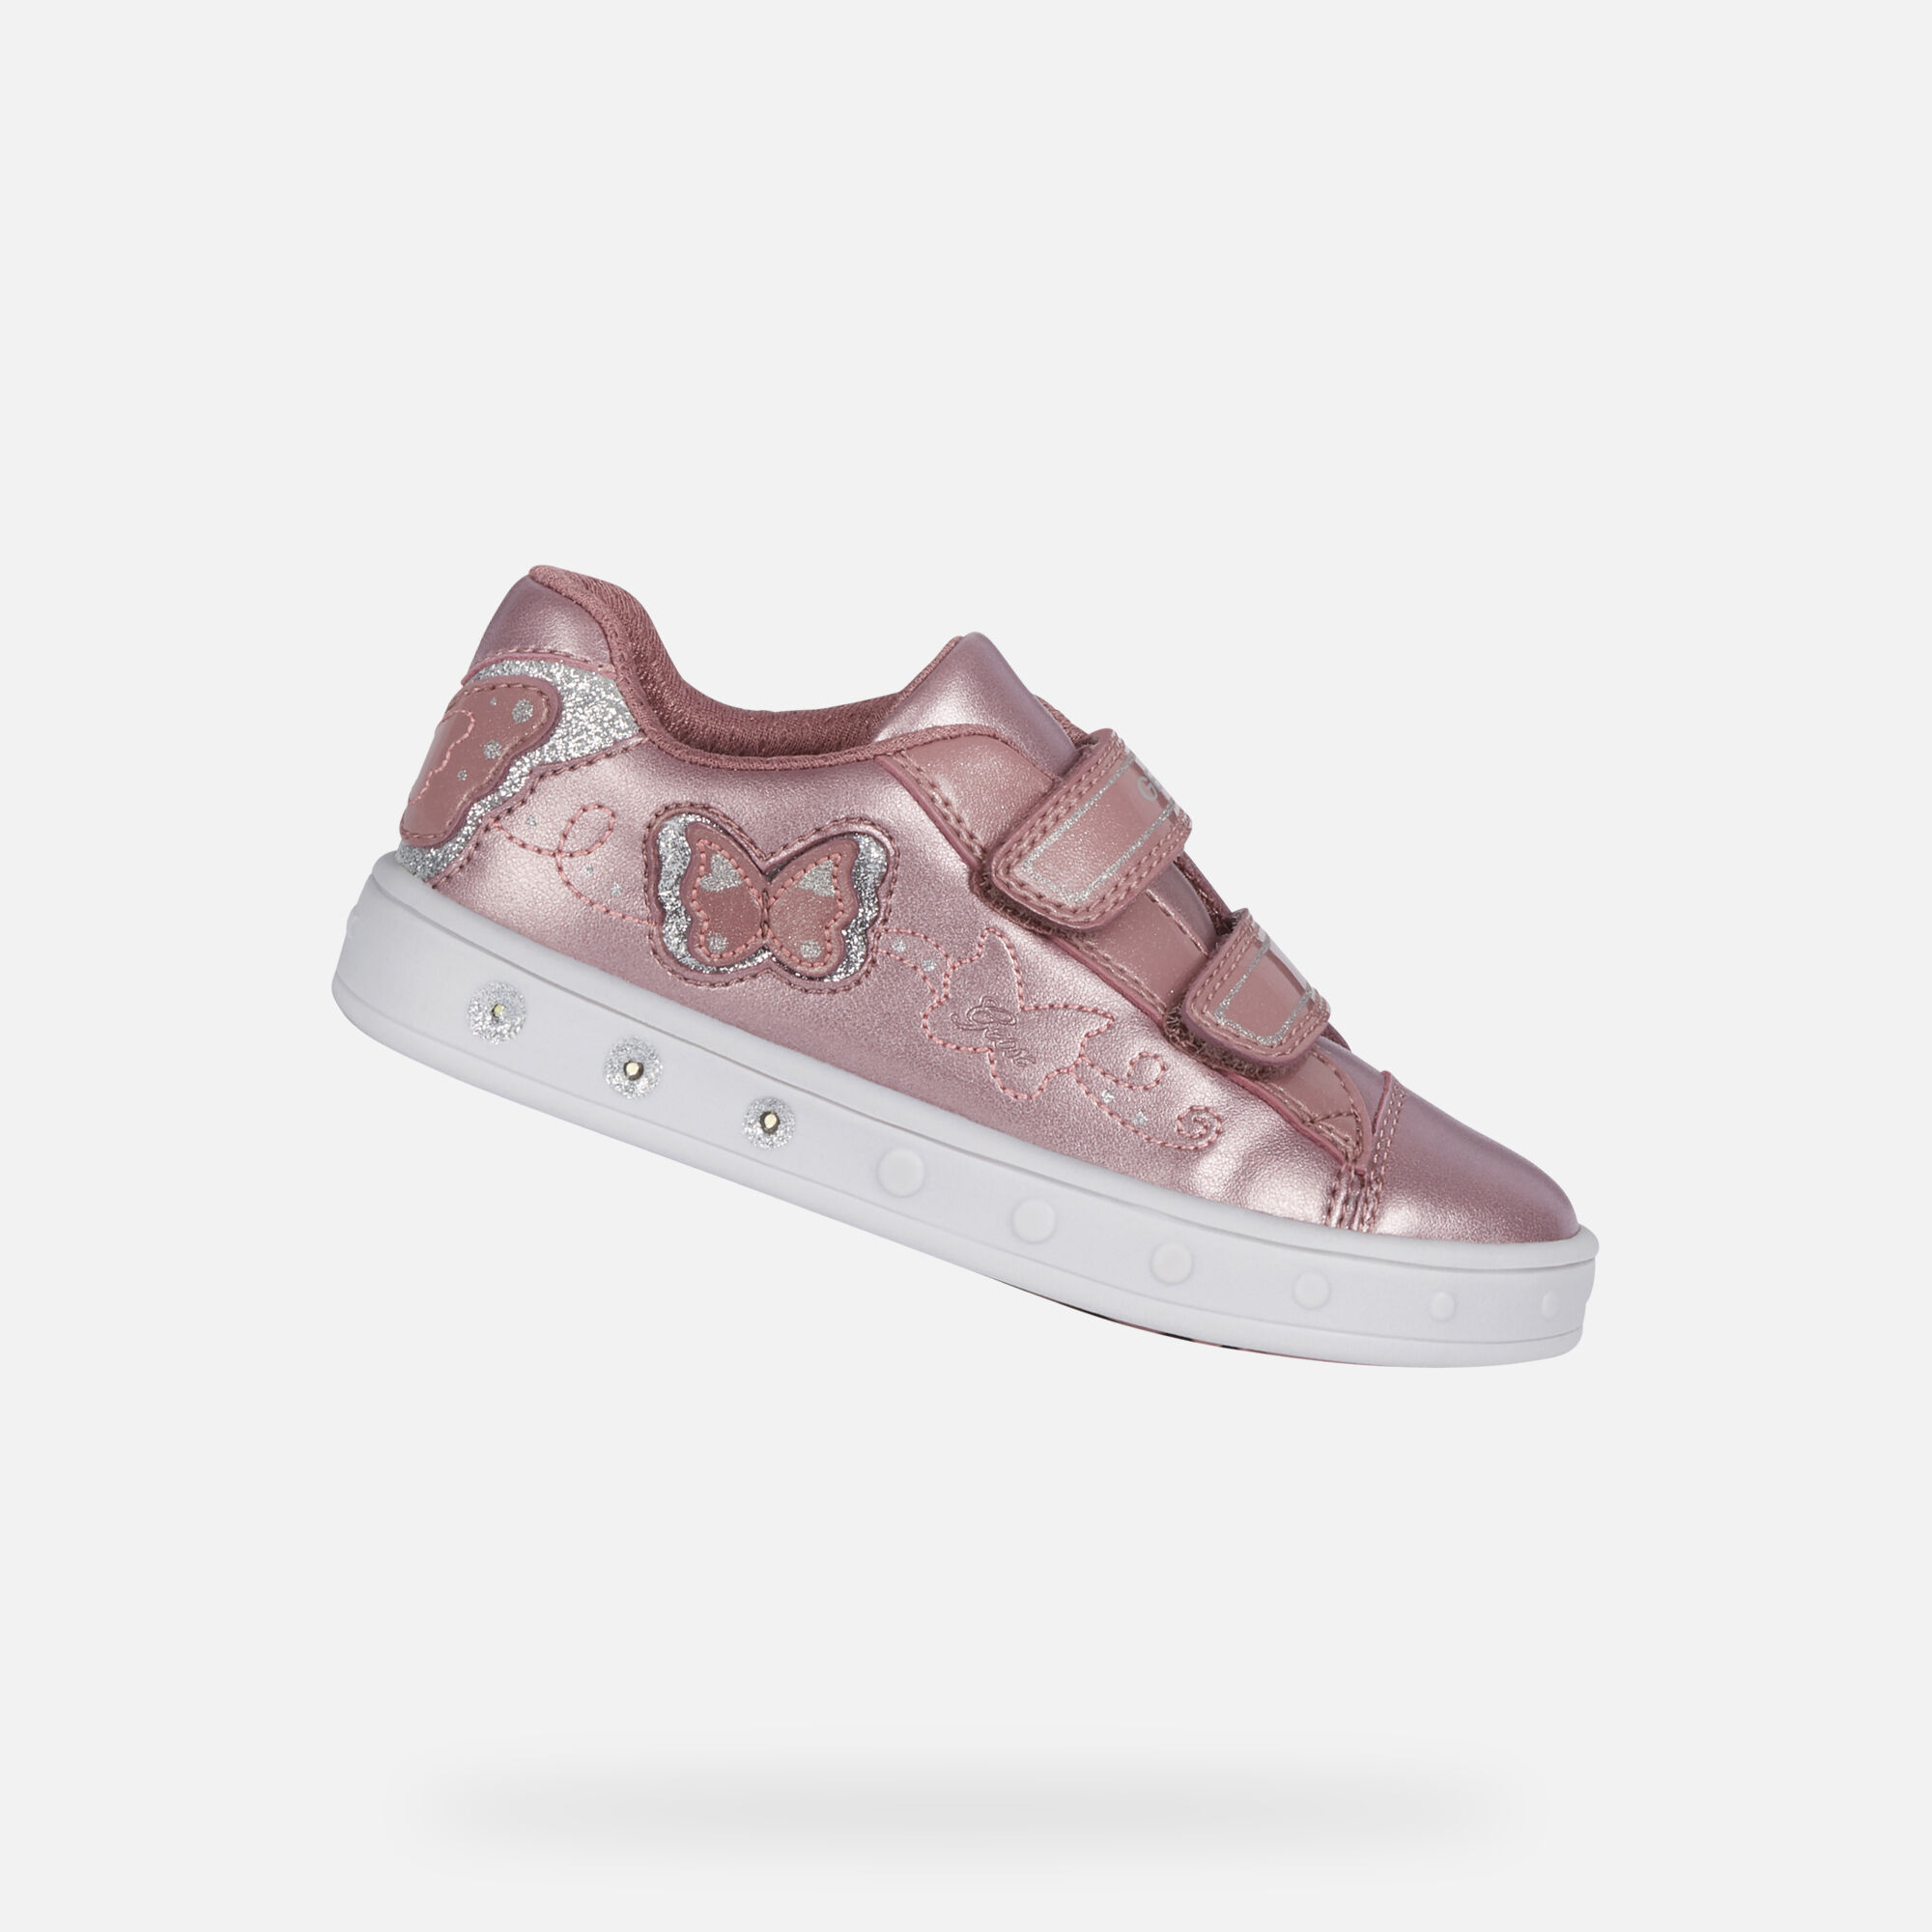 Geox Sneakers Basse Bianco | Sneakers Basse Bambina 50